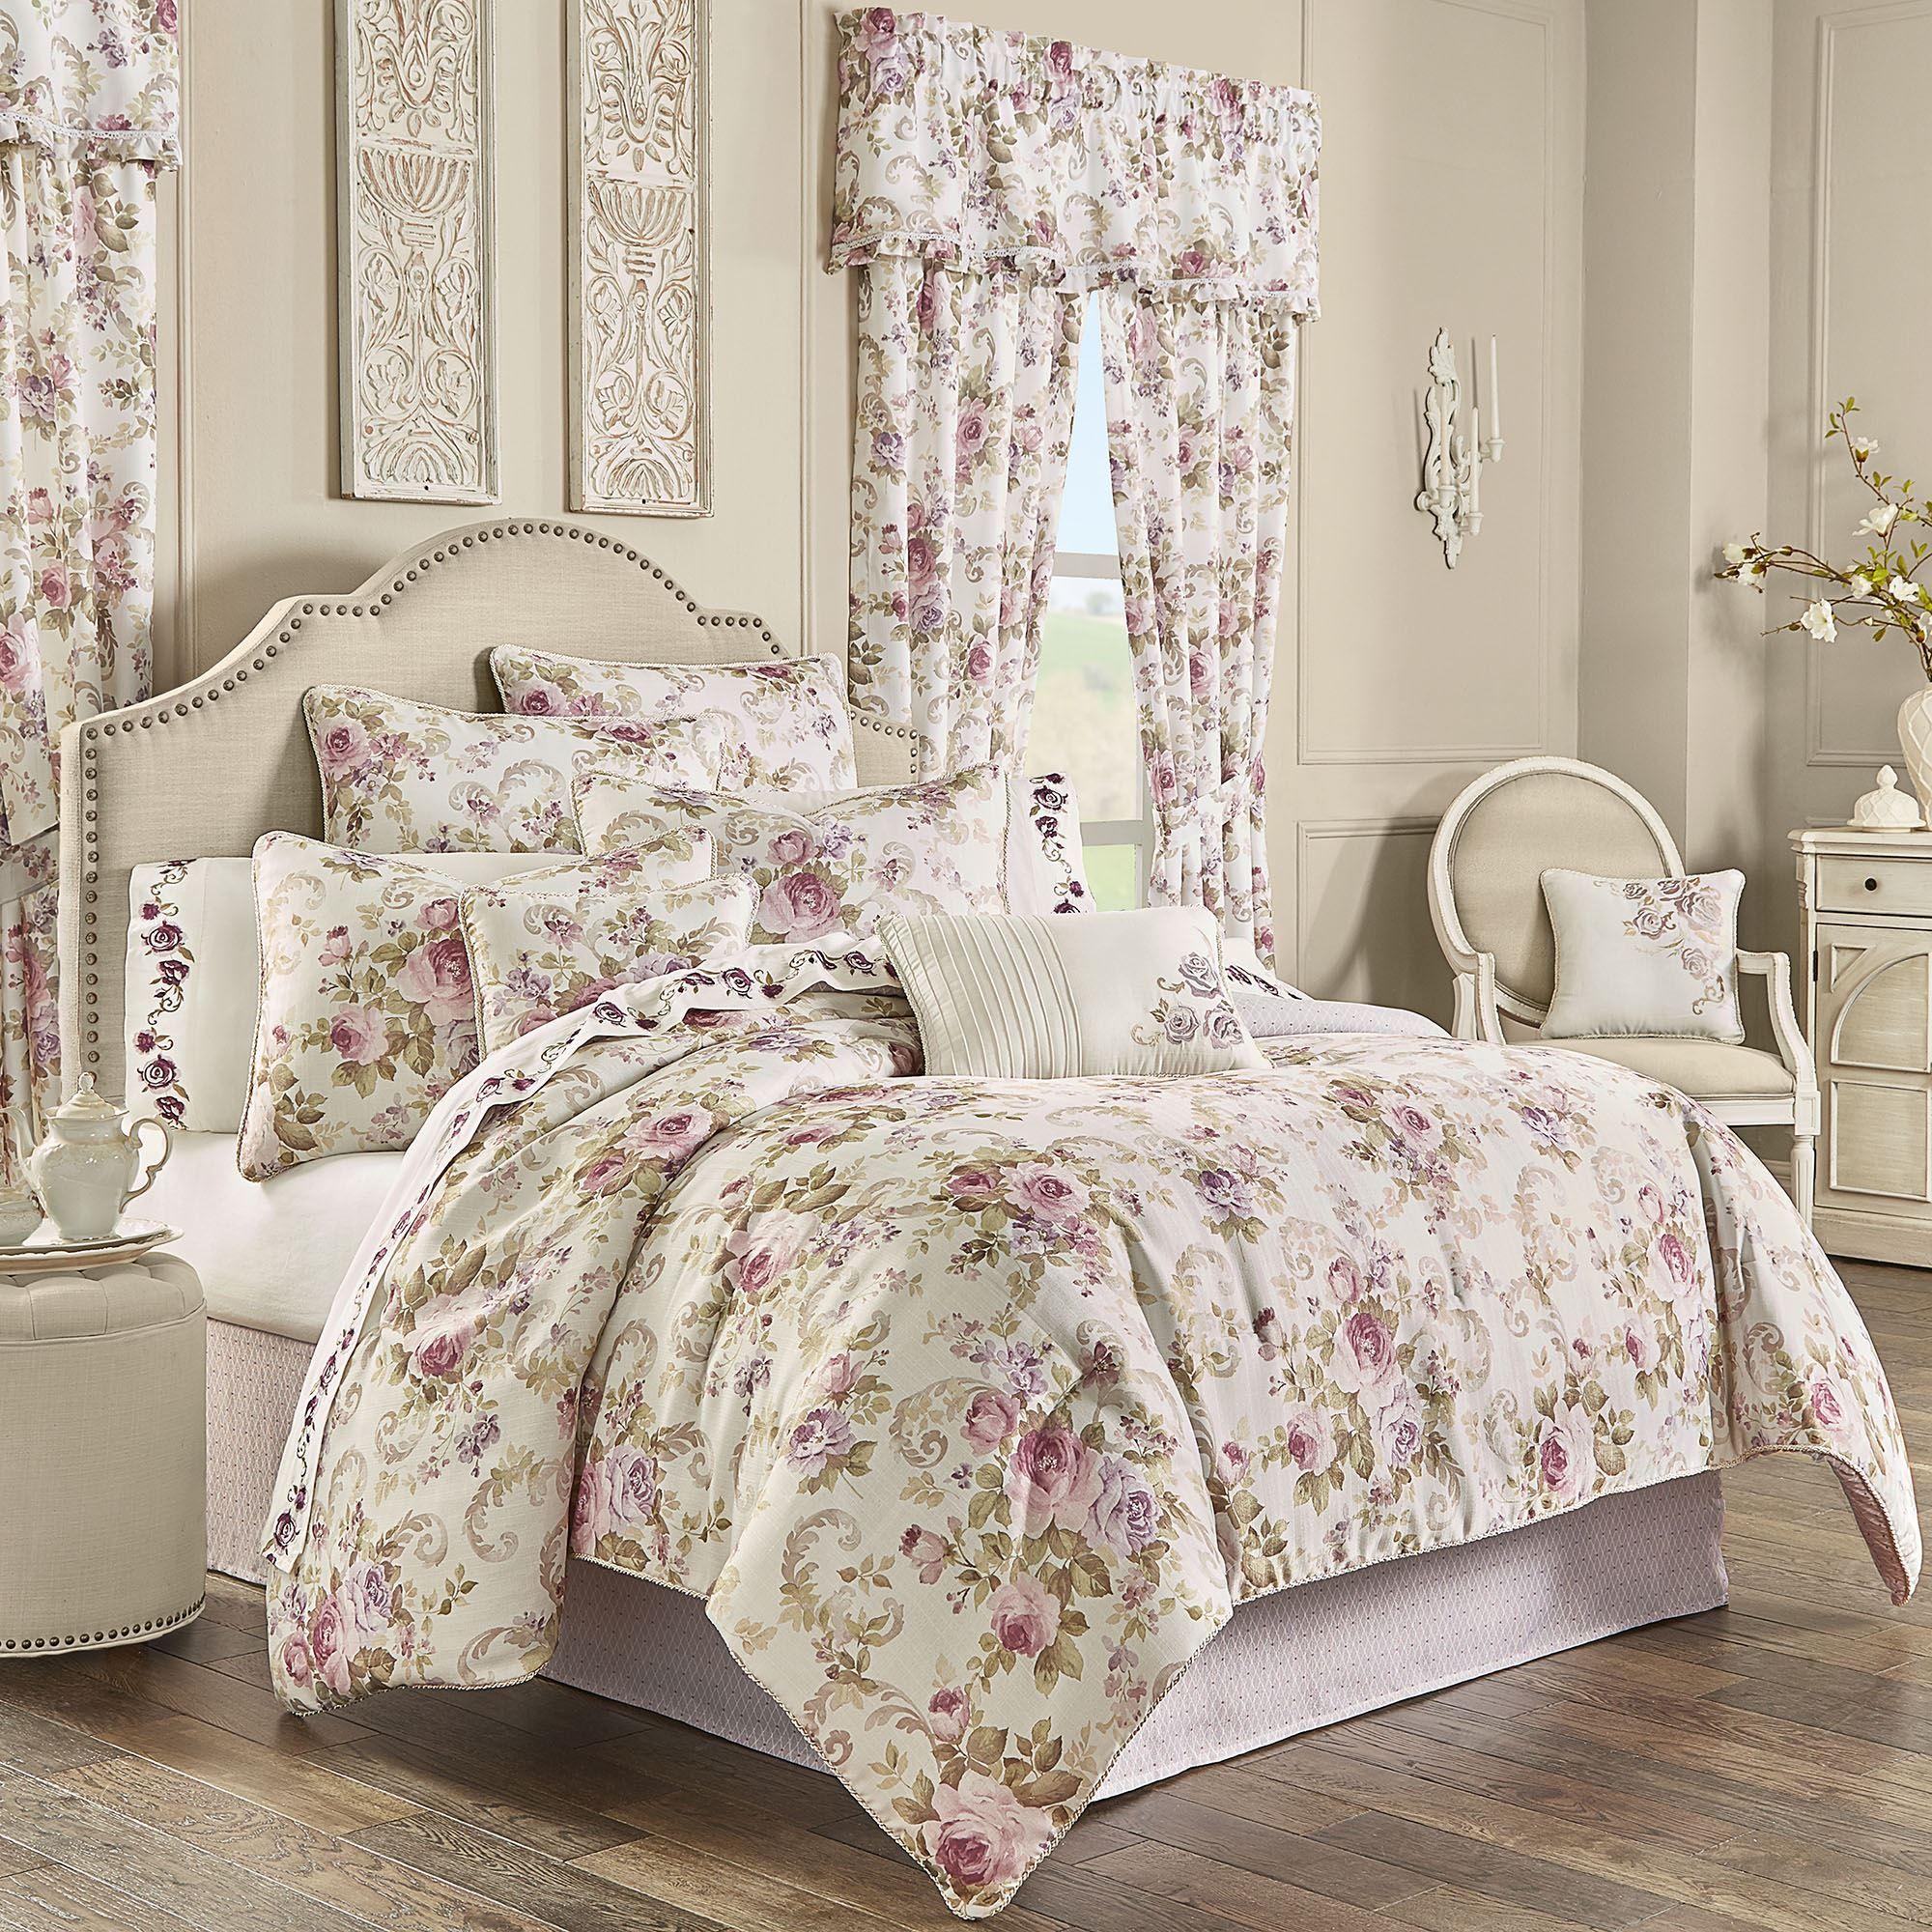 Chambord Lavender Floral Comforter Bedding By Royal Court